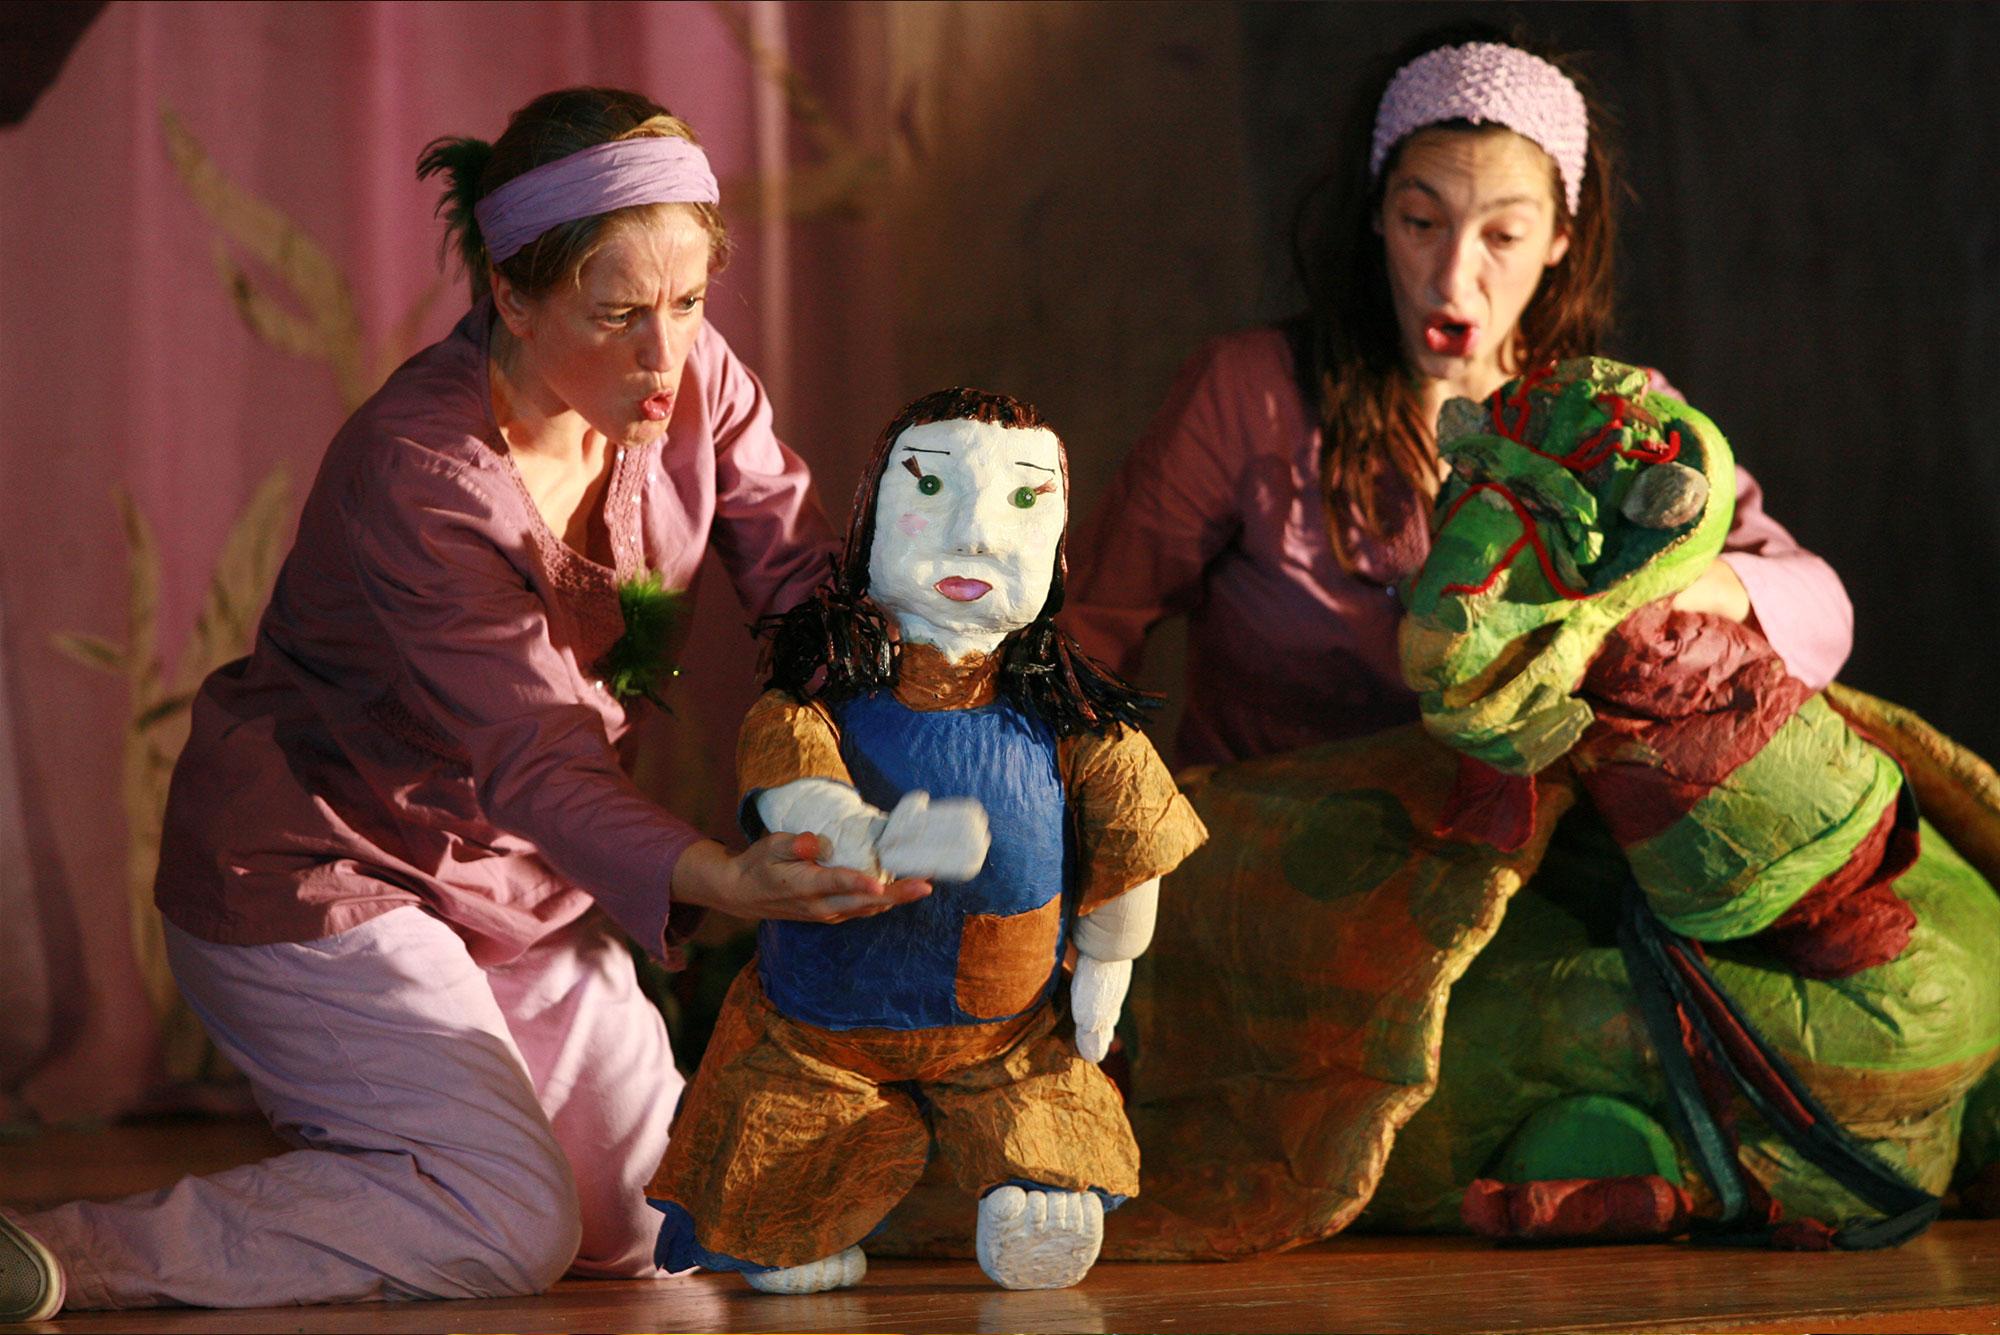 compagnie_artemisia_spectacle_jeune_public_marionette_envole-toi-1